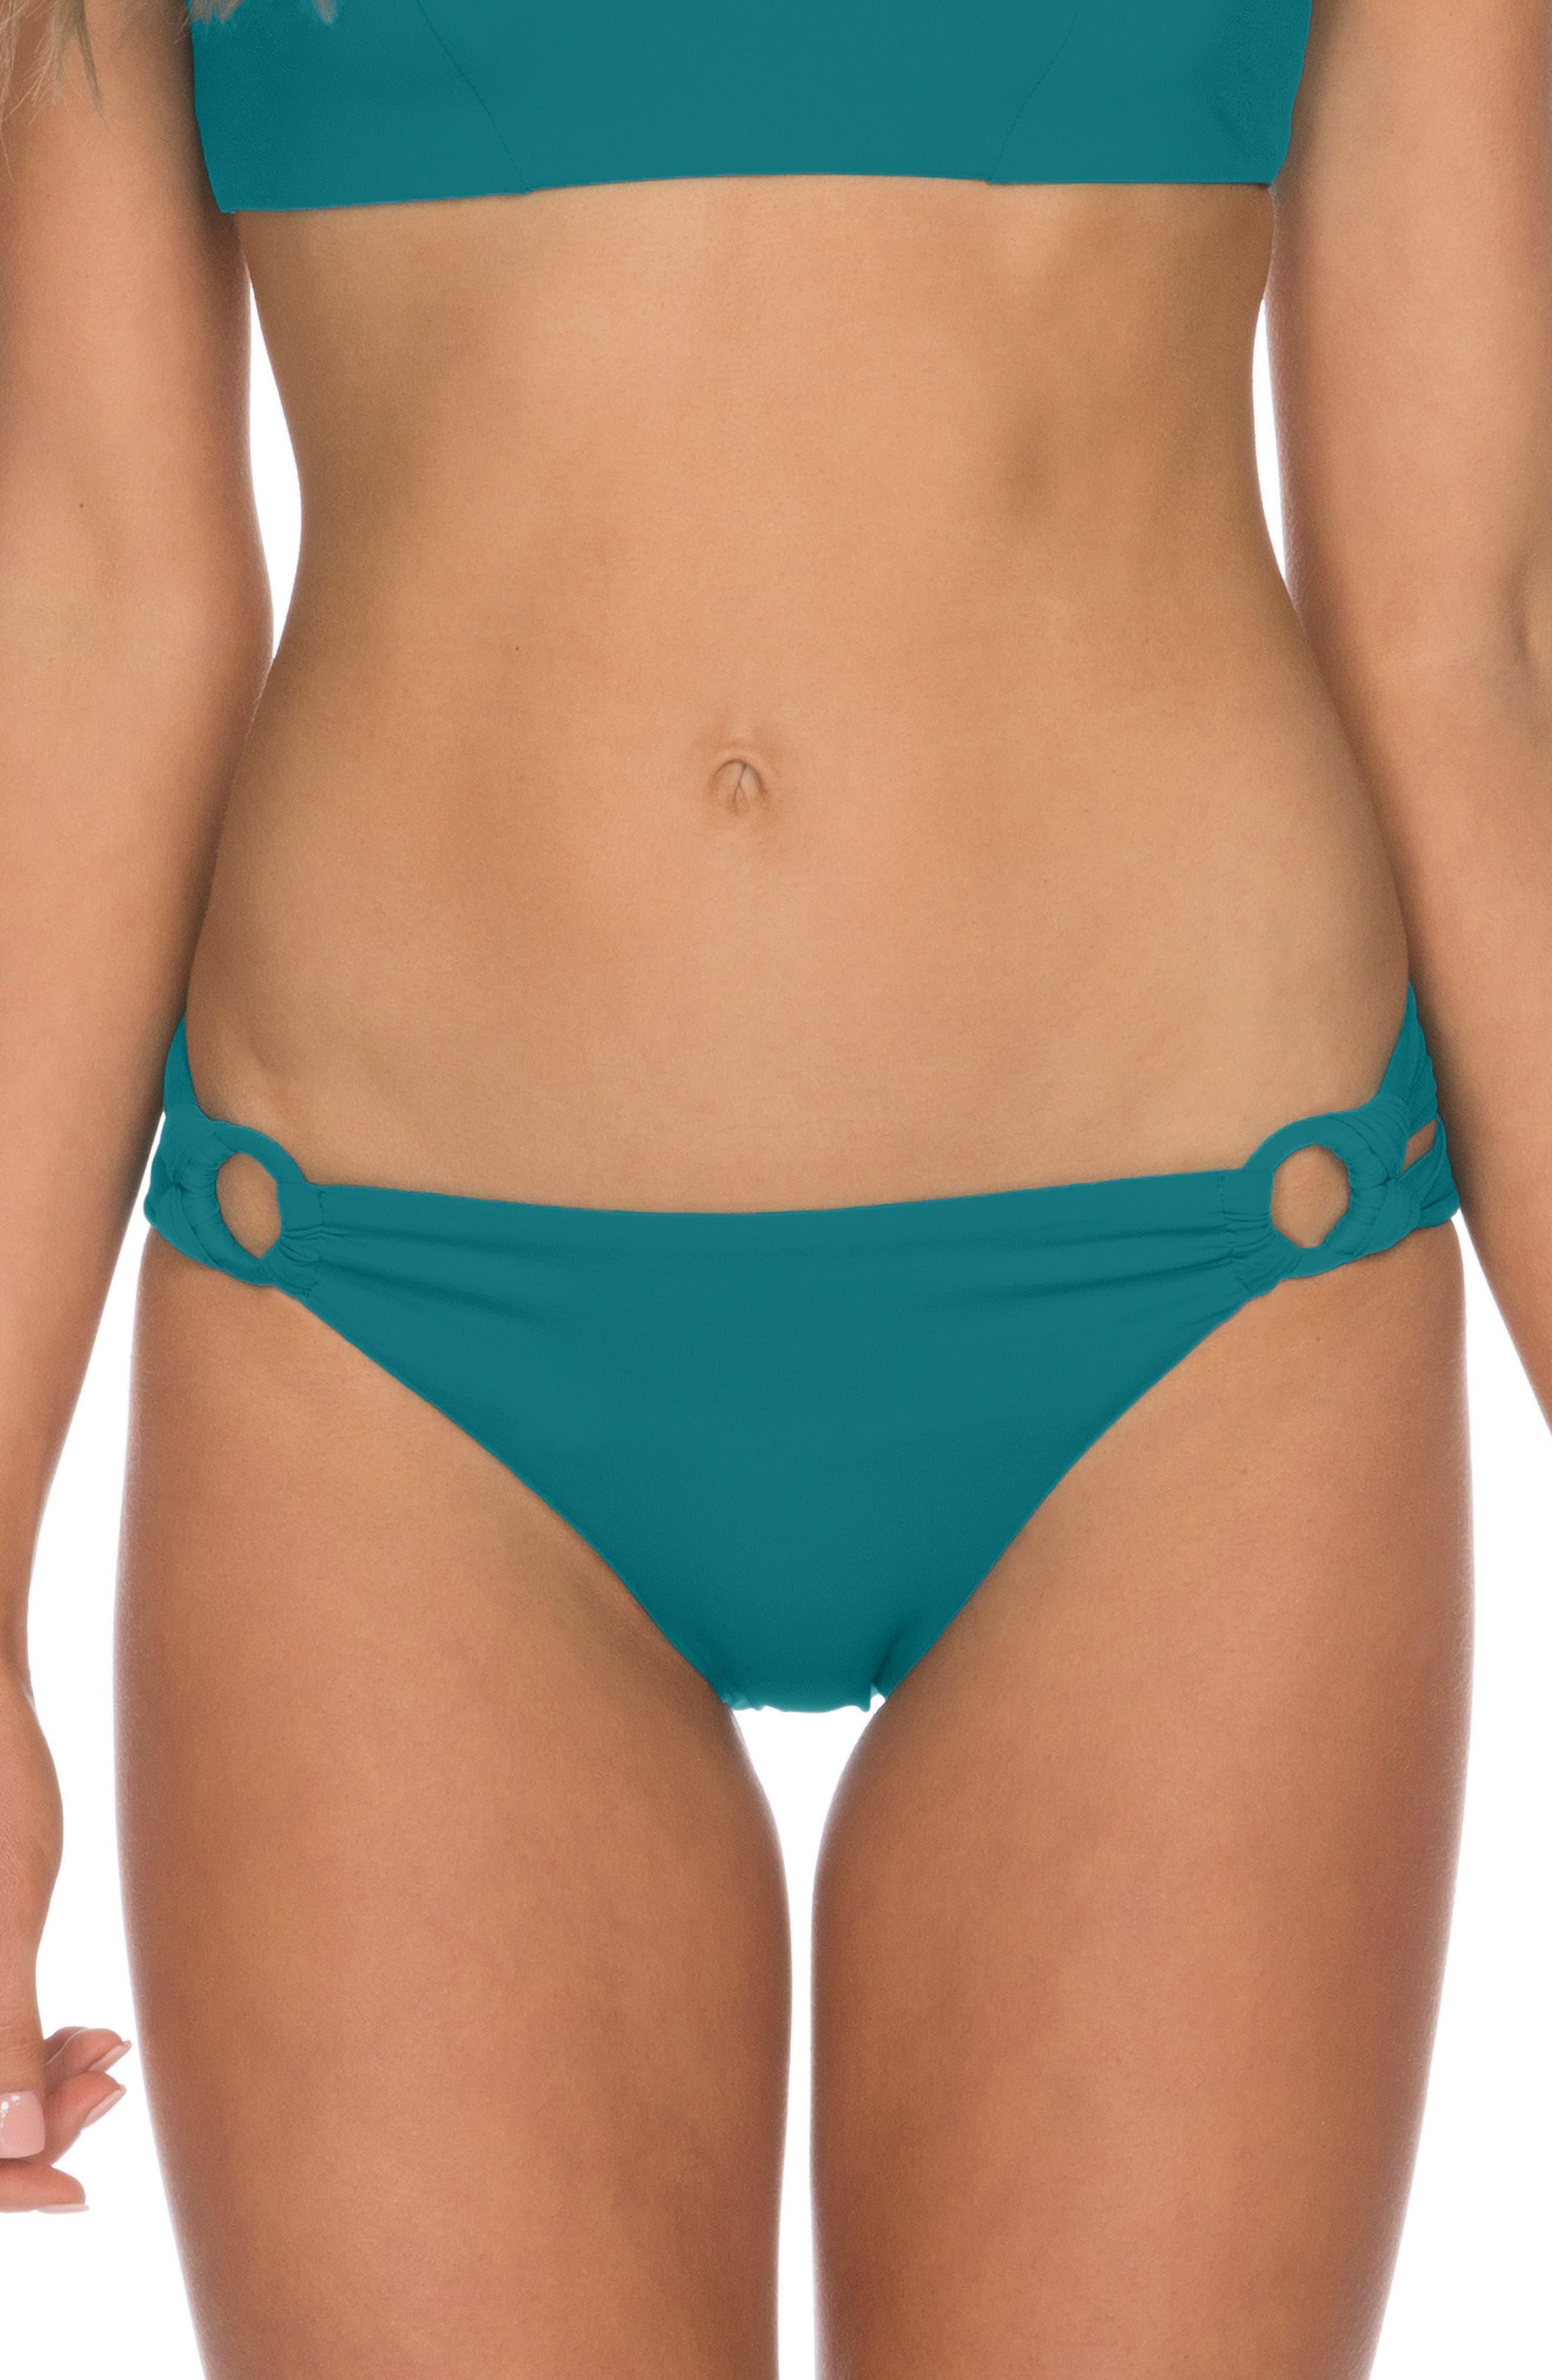 Isabella Rose Pebbly Beach Bikini Bottoms, Blue/green